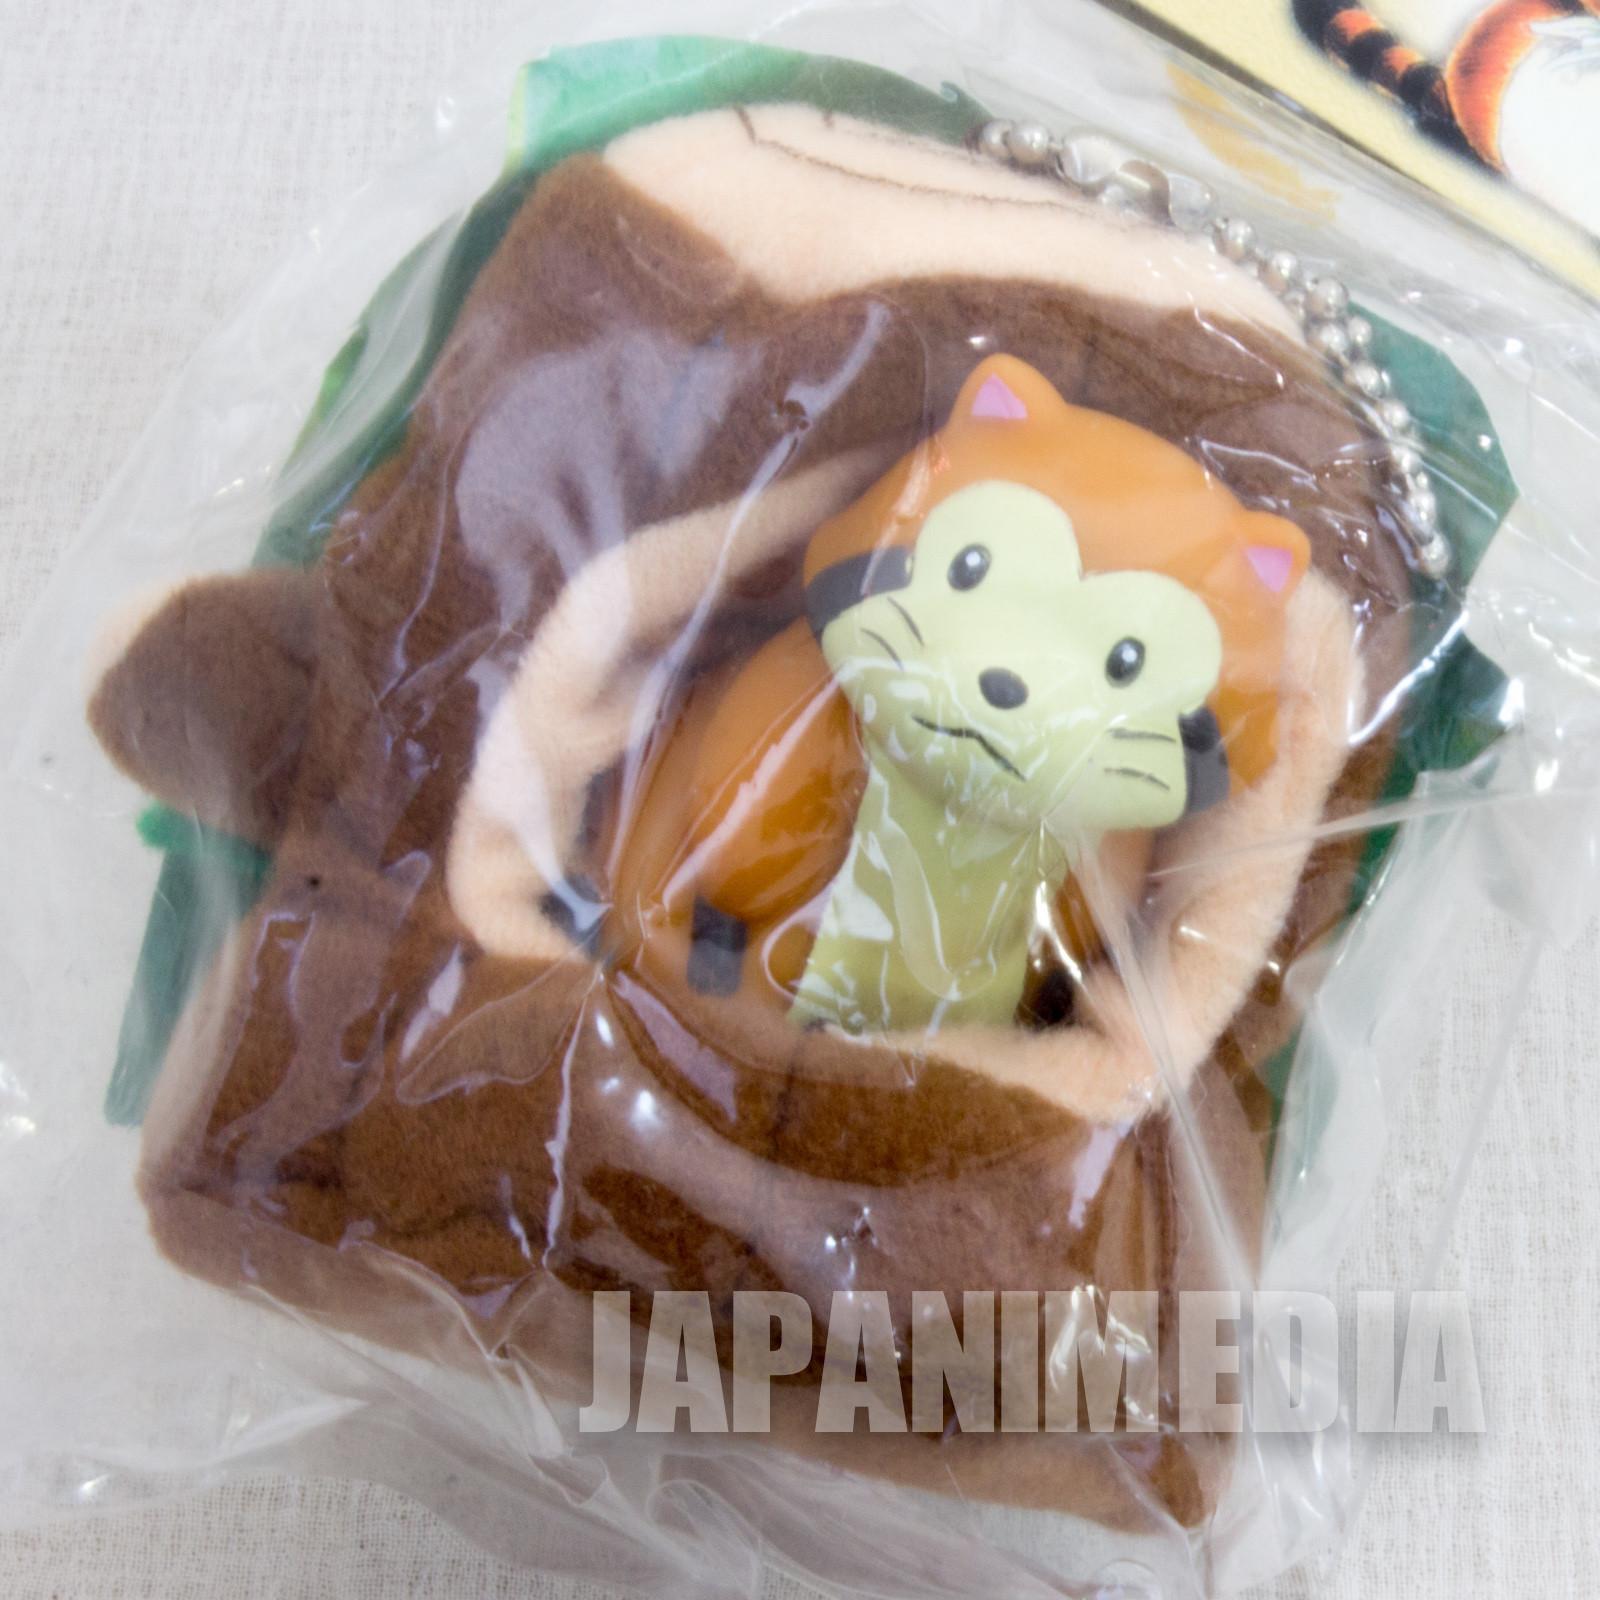 Rascal the Raccoon Figure Mascot Ballchain JAPAN ANIME